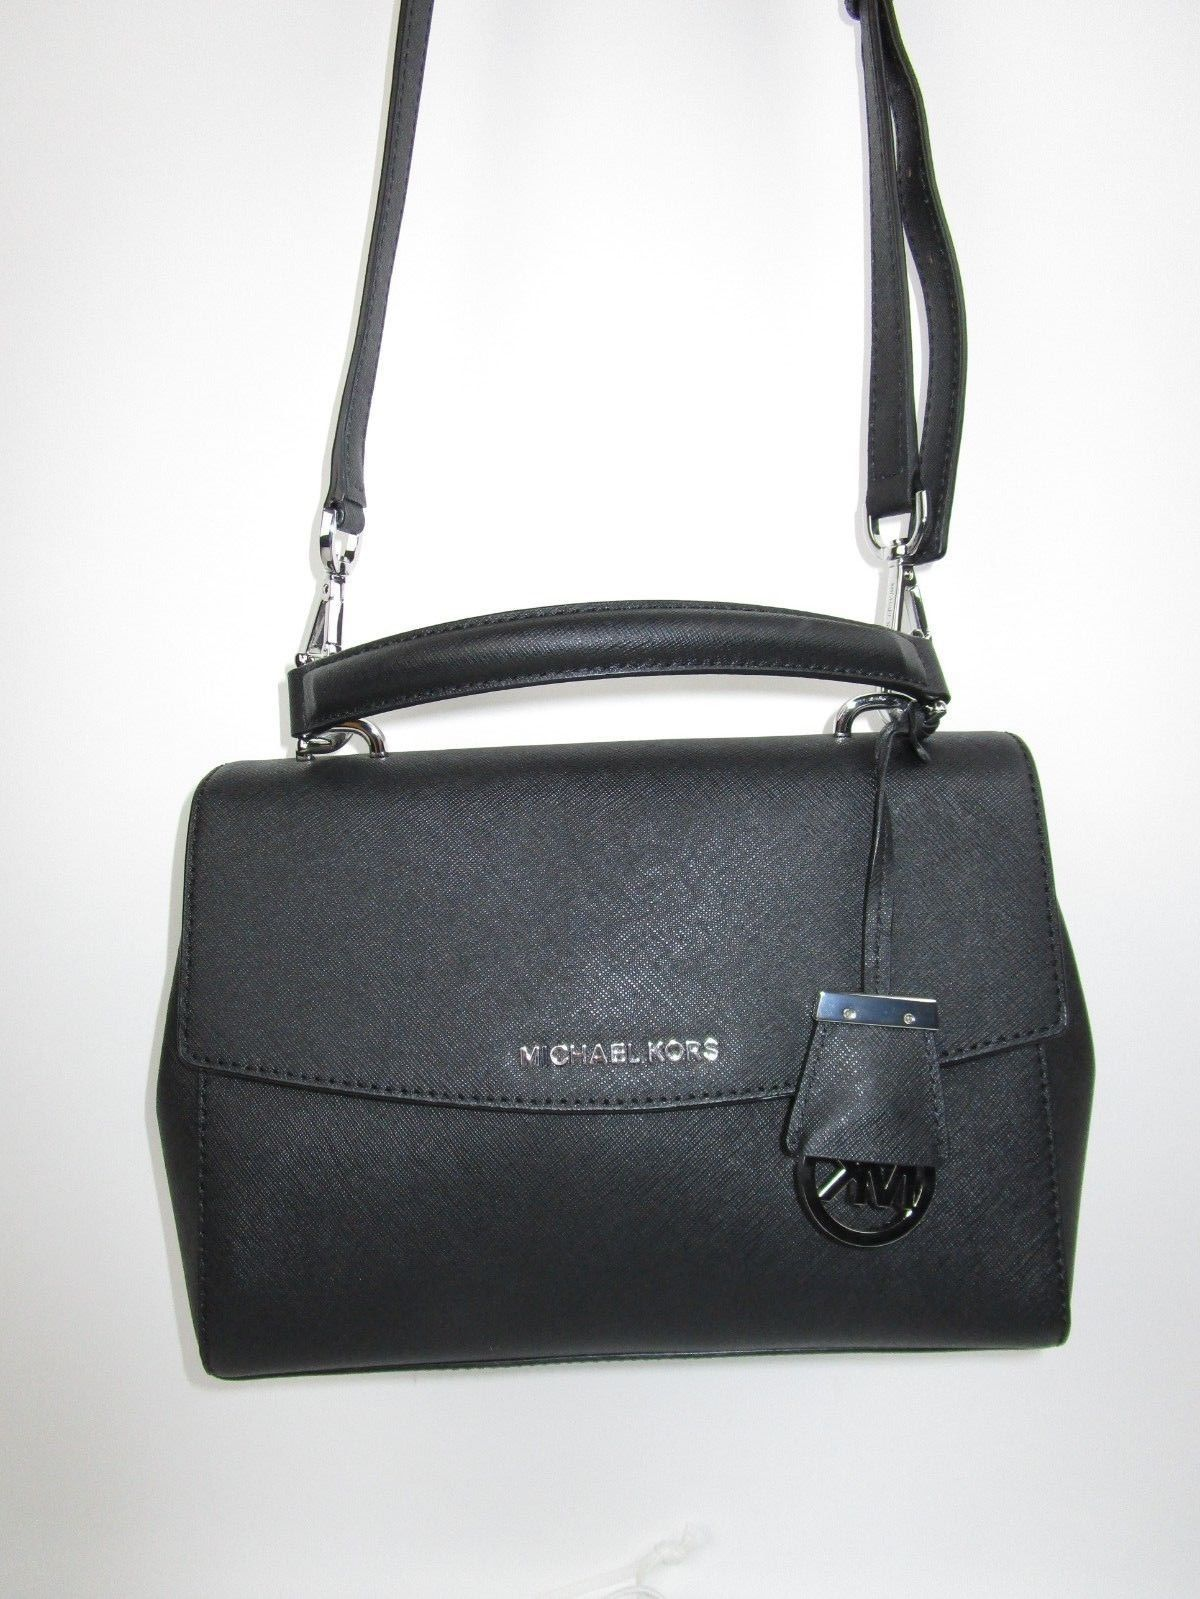 1bbb90306dac Michael Kors Ava Small Top Handle Satchel Shoulder Bag Cross-Body  268 Black